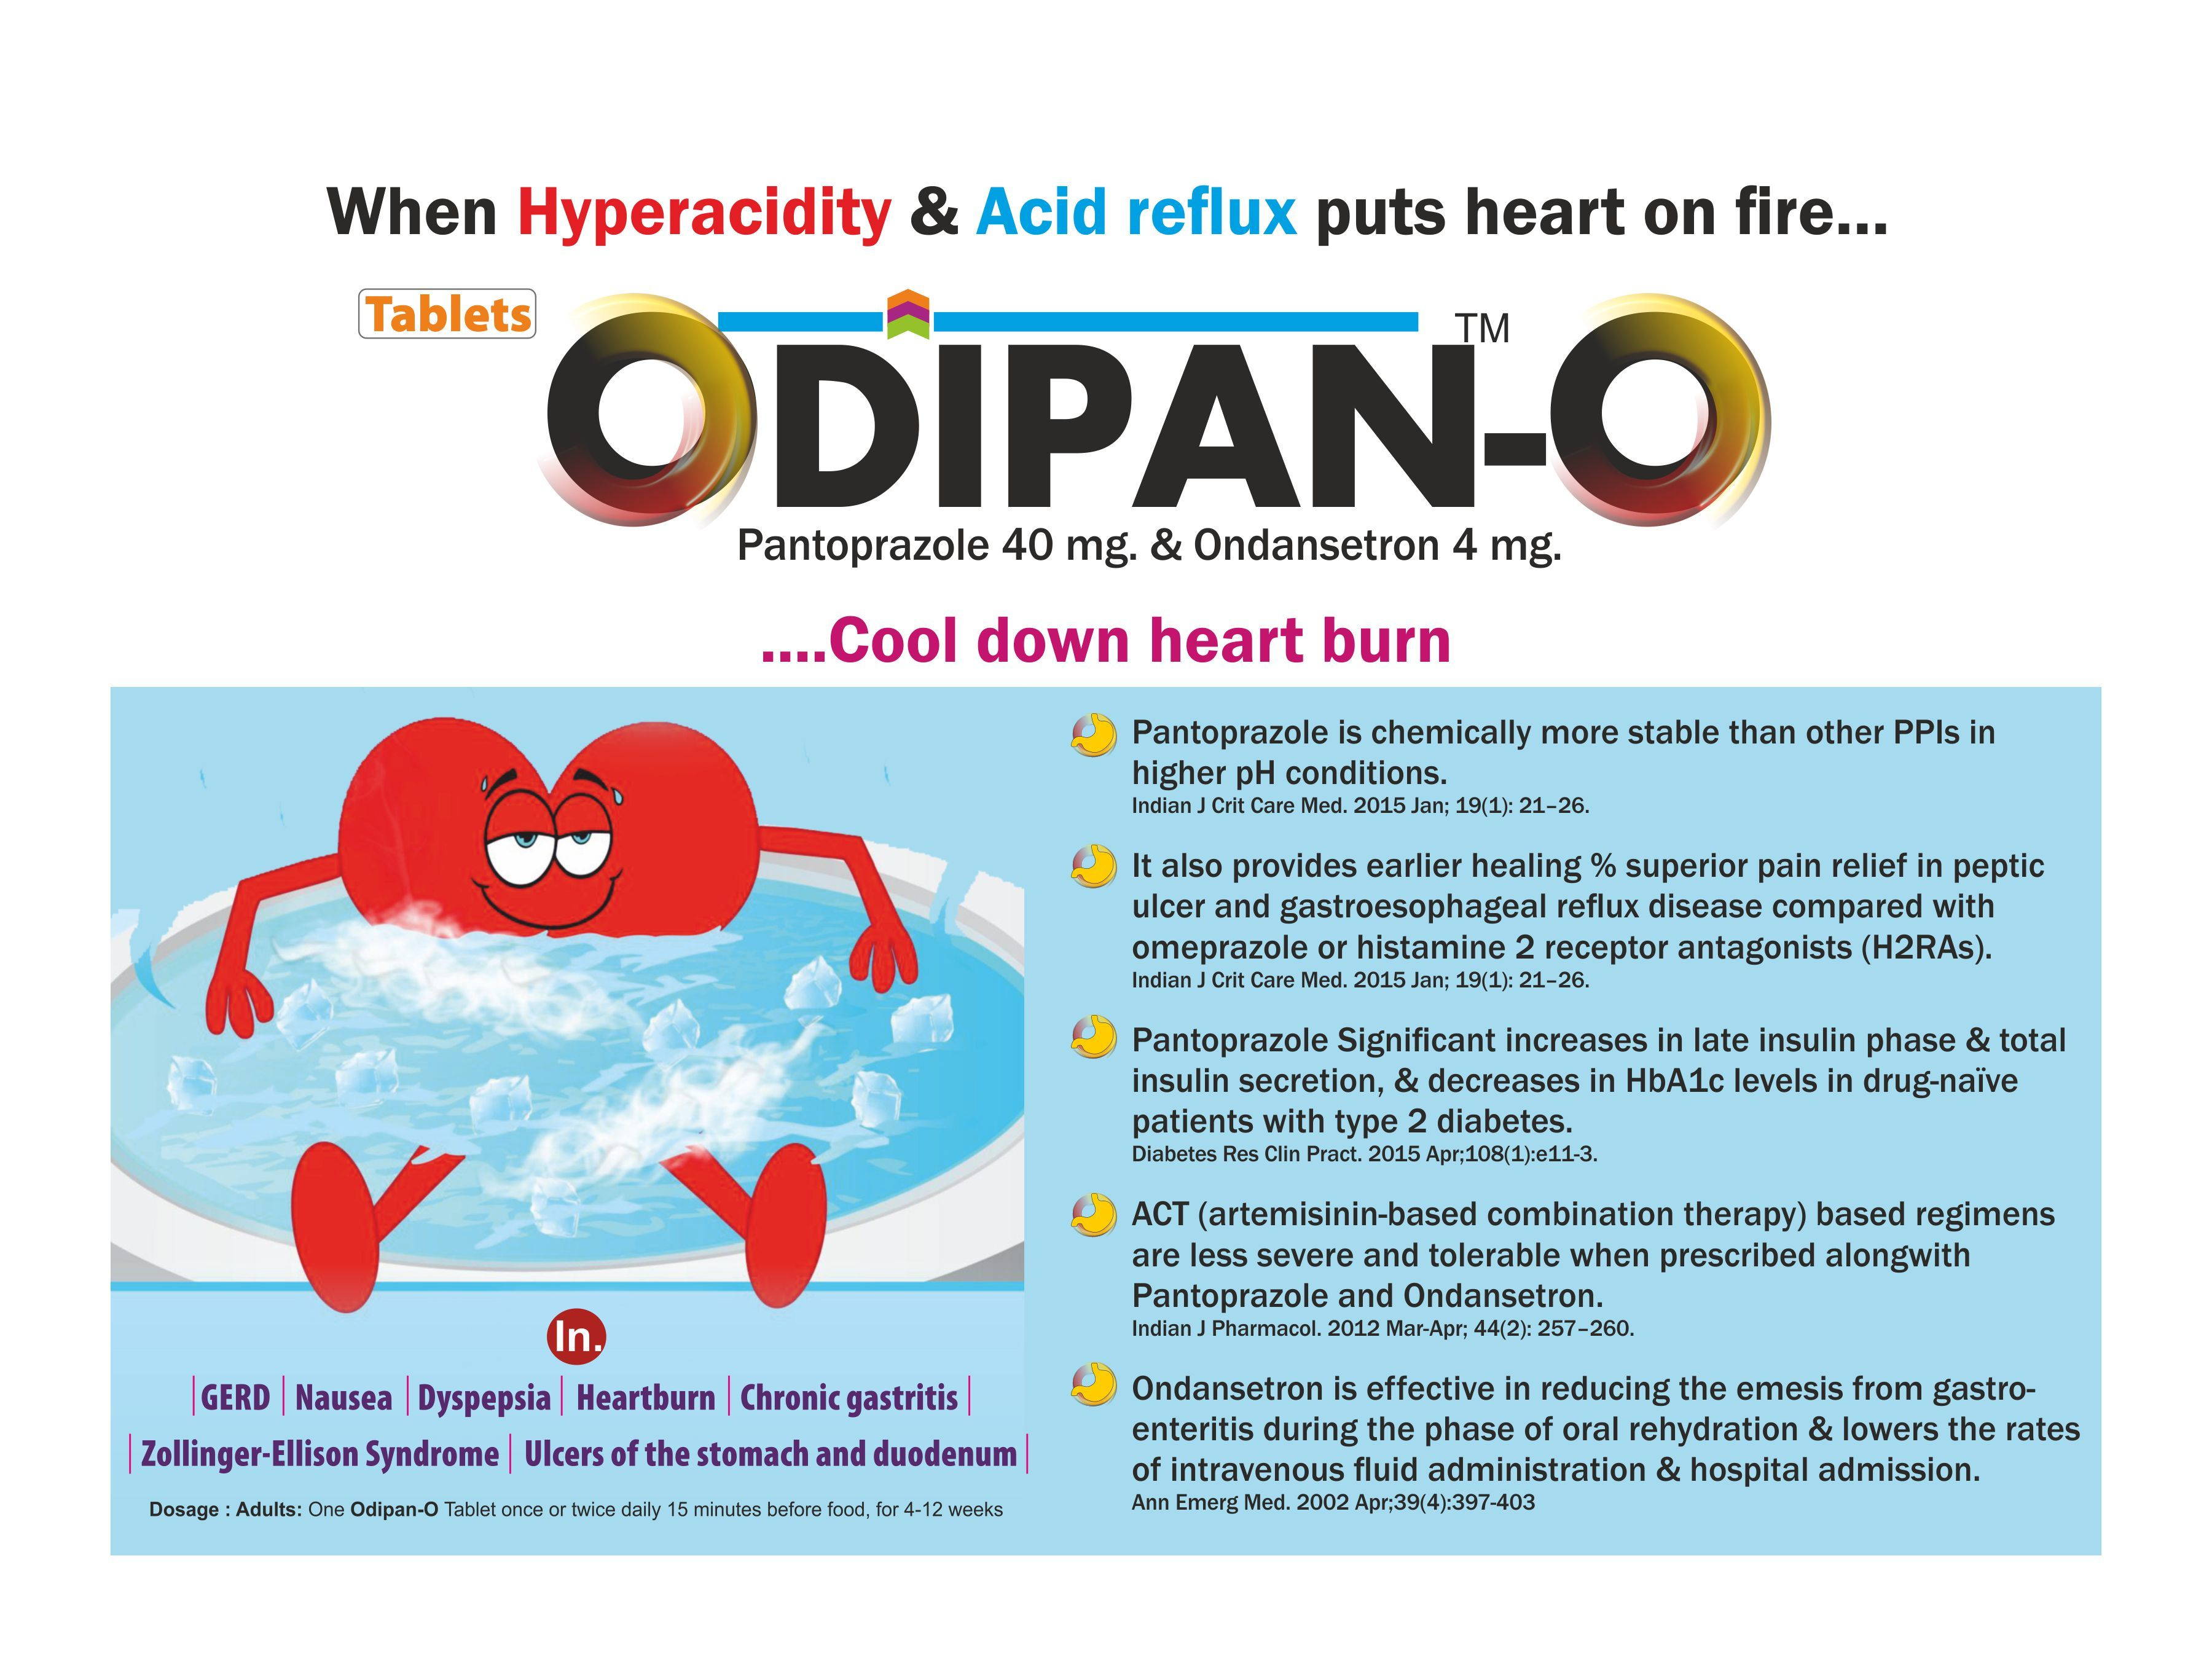 Pantoprazole 40 mg & Ondansetron 4 mg Tablets